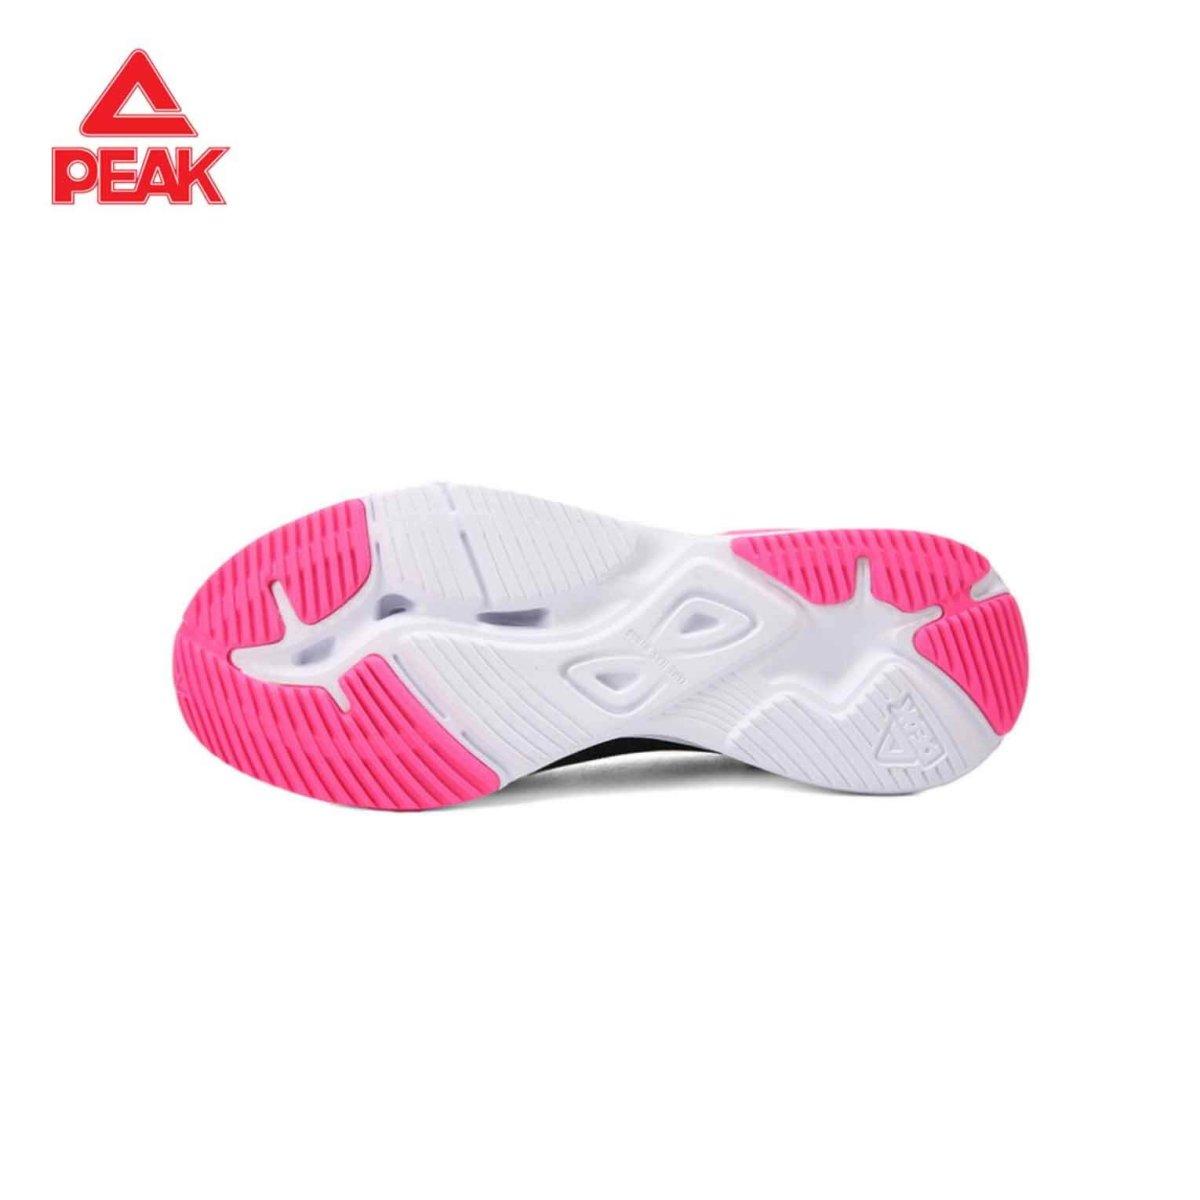 Peak-Shoes-EW02168H-pink-2